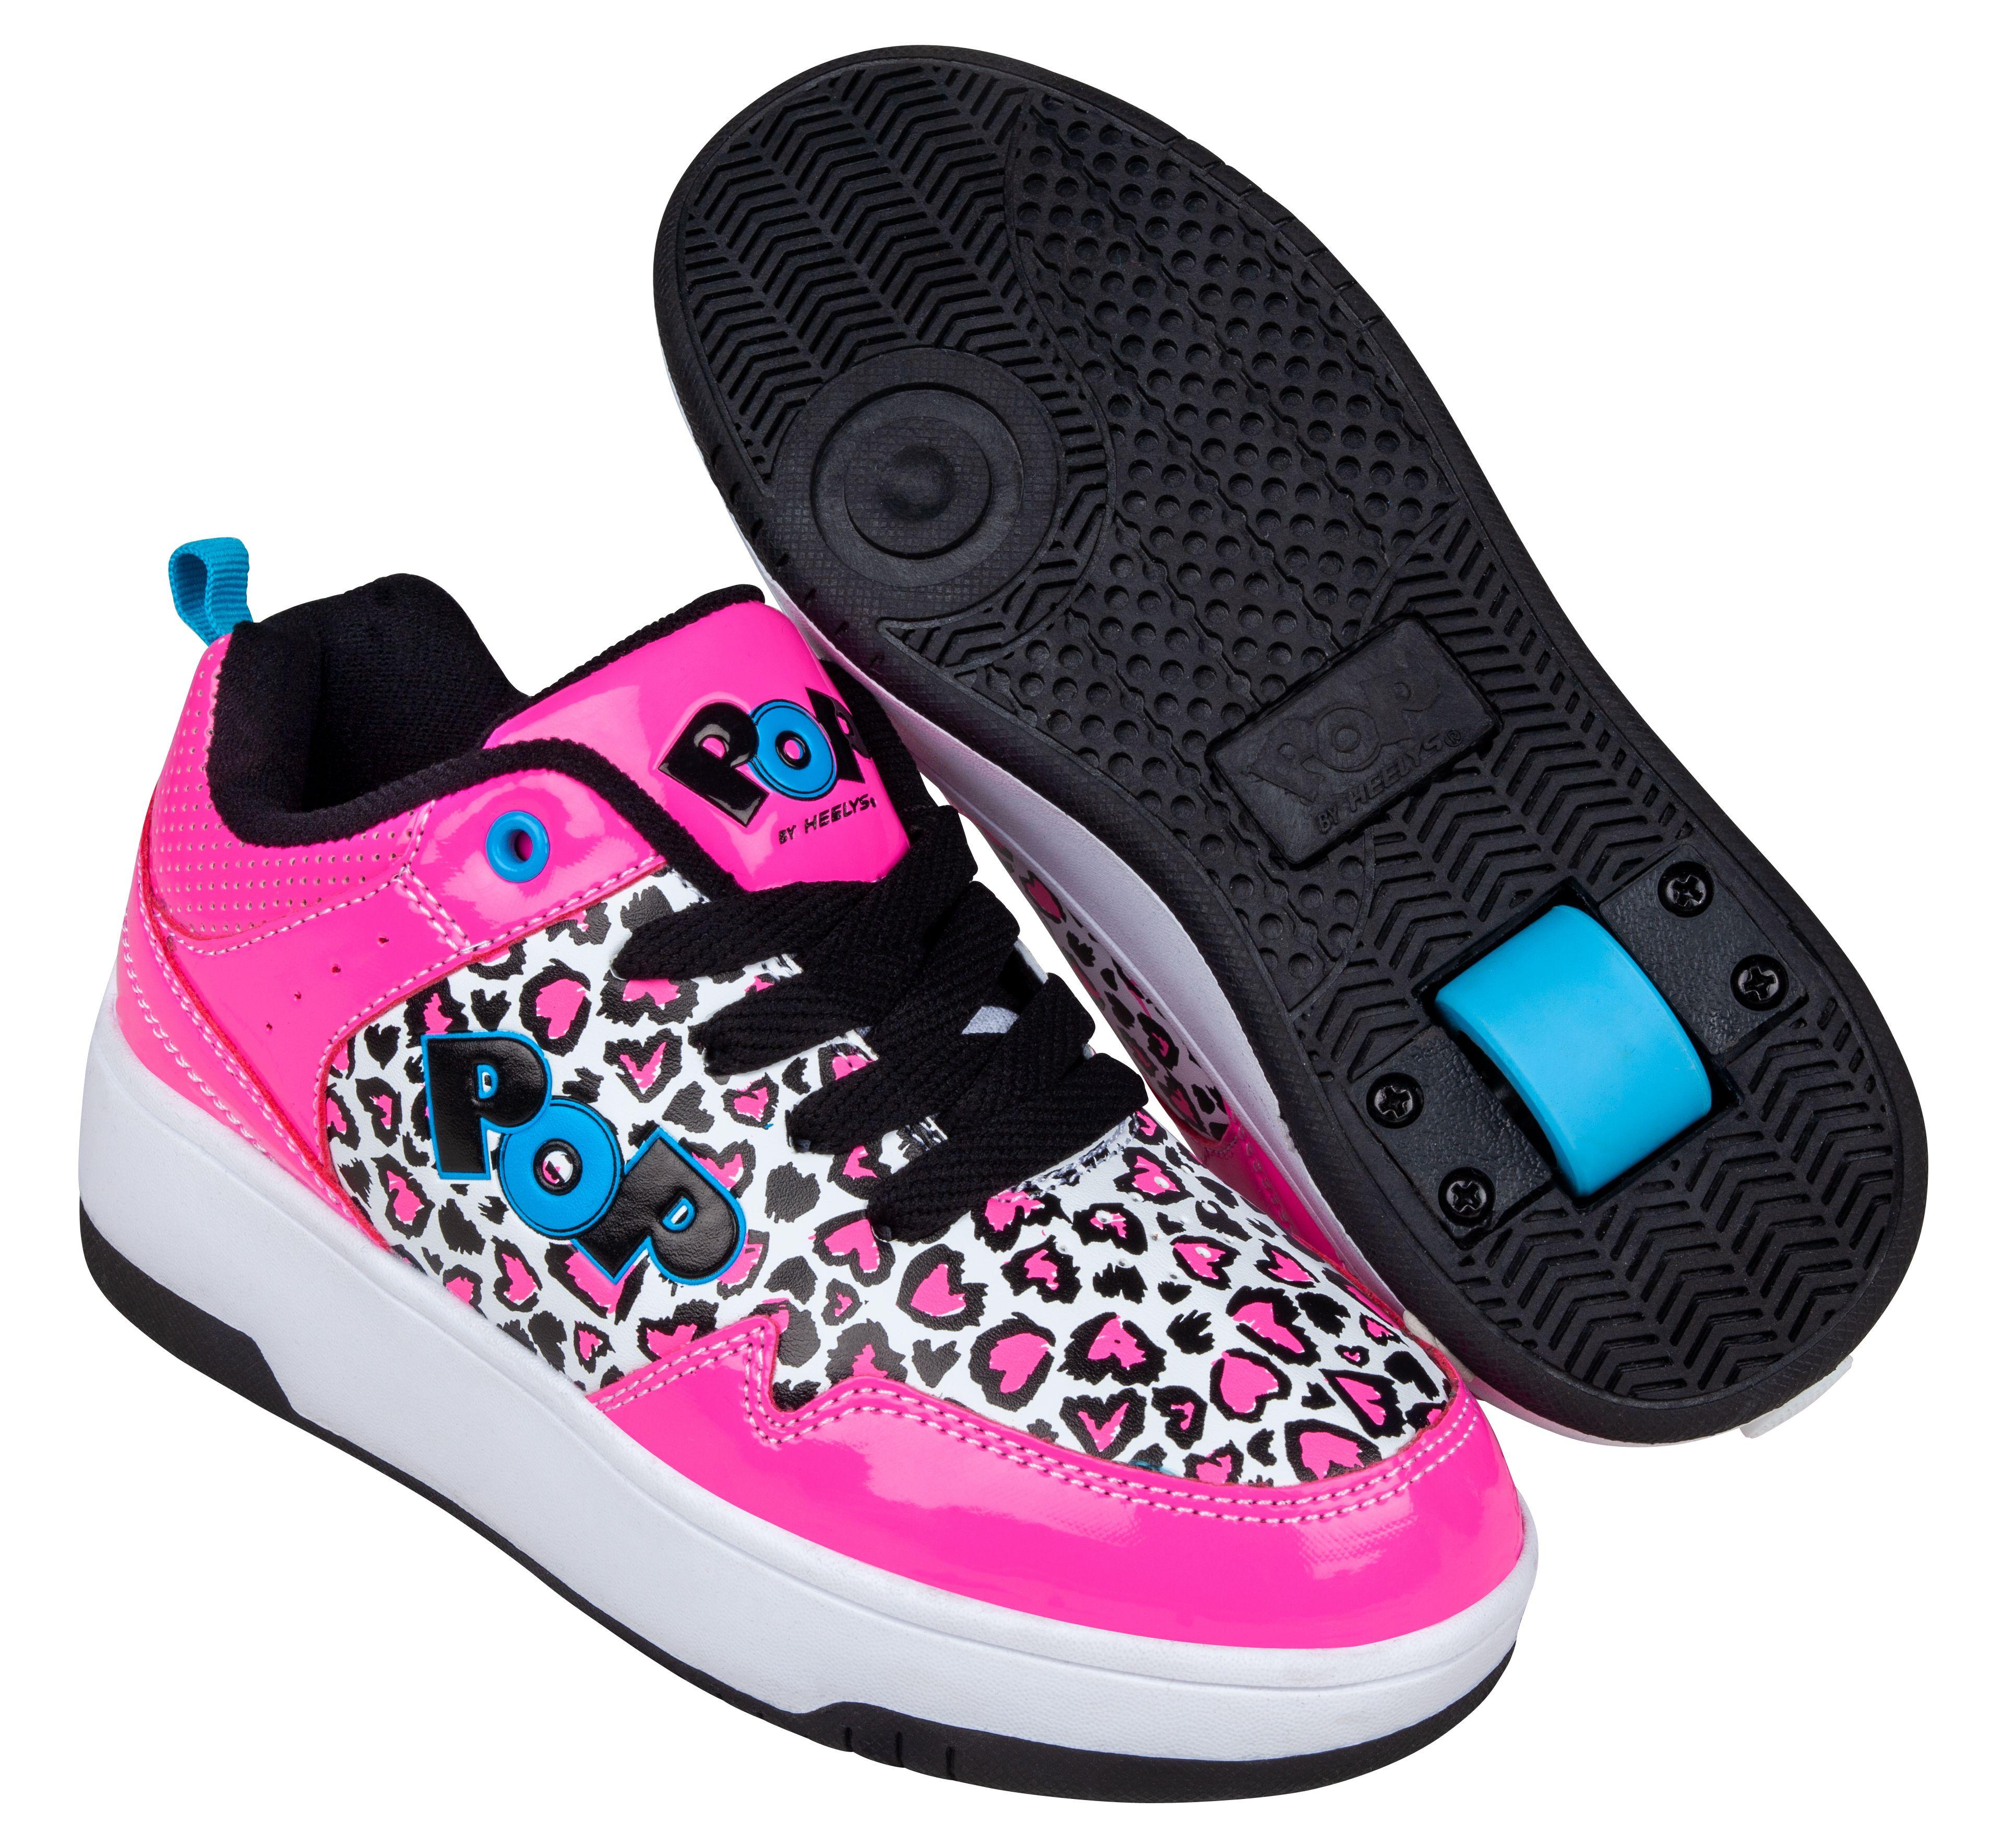 Heelys POP Shoes - Neon Pink (size 30) (POP-G1W-0055)